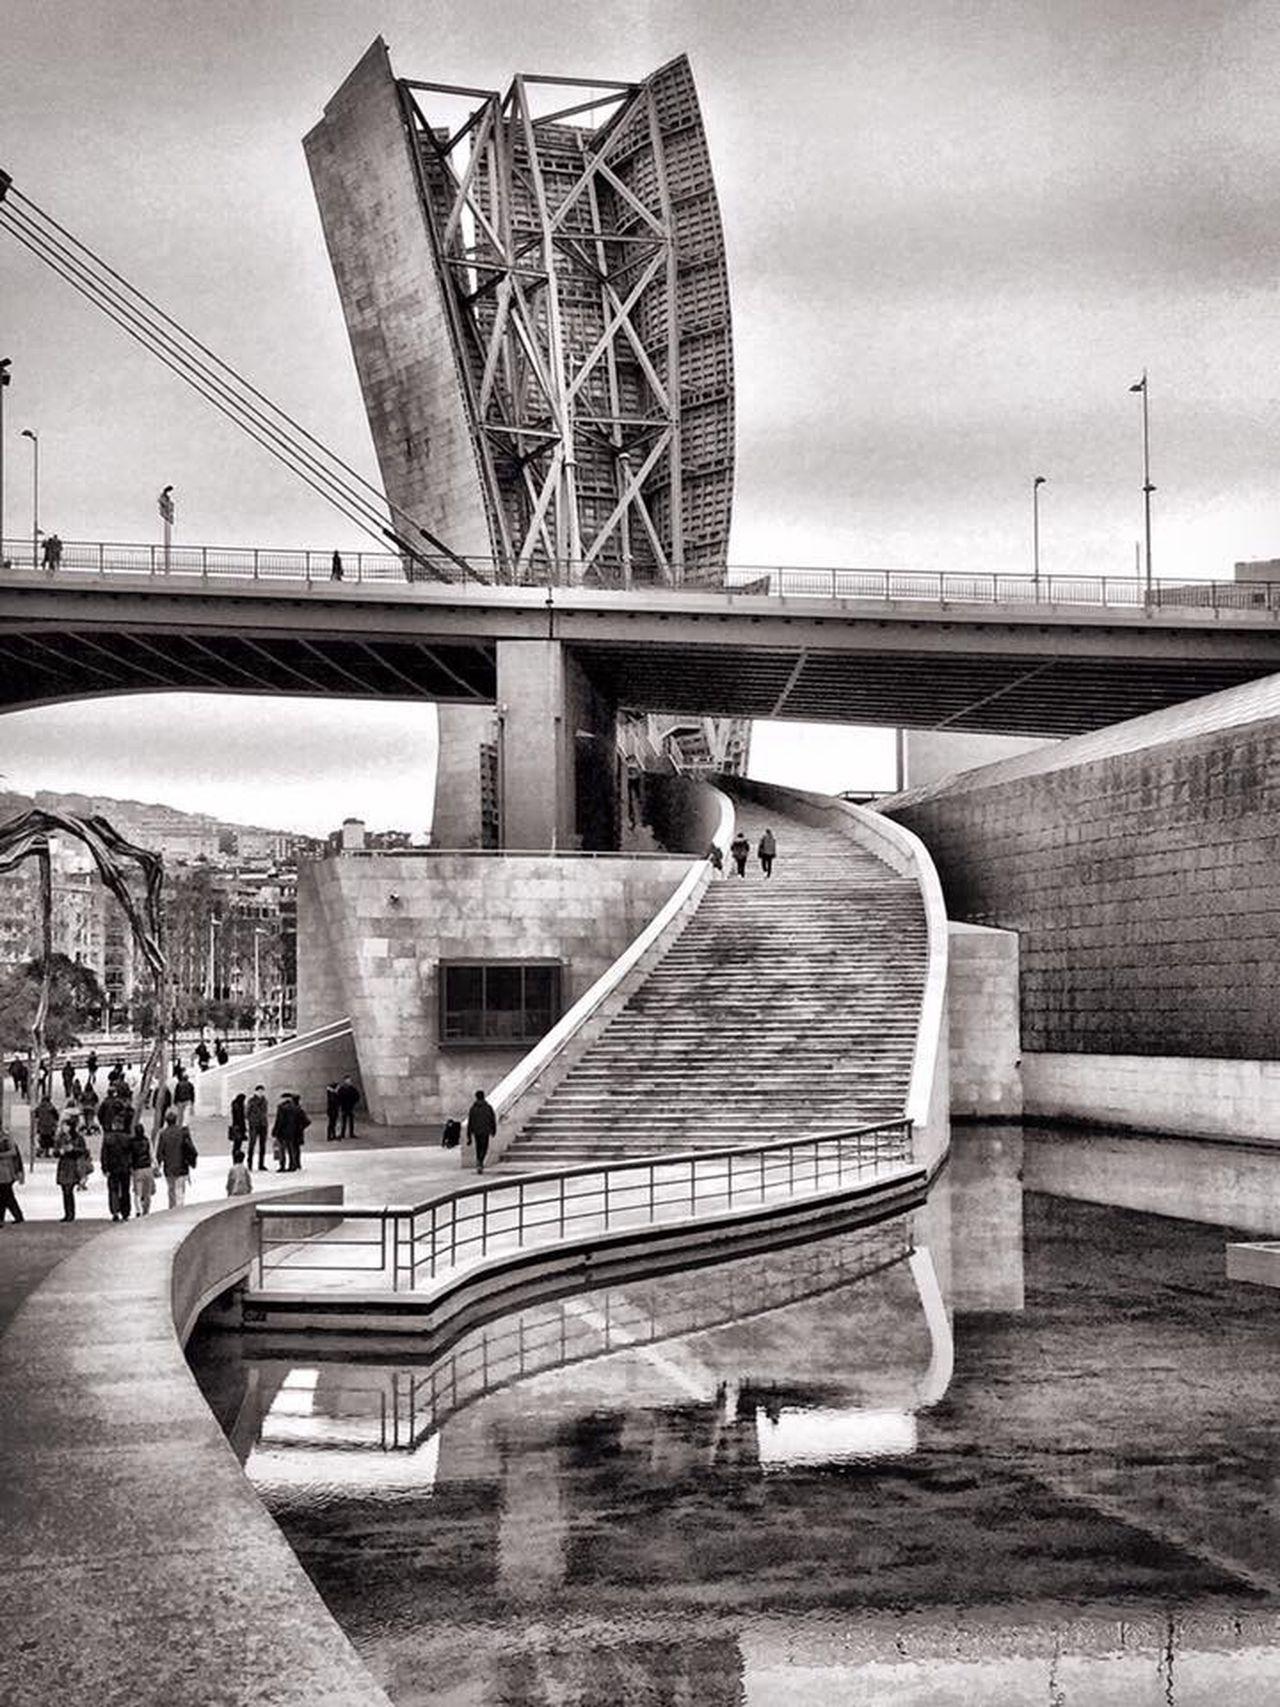 Bilbao Bizkaia Bilbaolovers Bilbaoarchitecture Bilbaoclick Bilbaocentro Bilbaostreets Blackandwhite Blancoynegro Monochrome IPhoneography Iphoneonly Iphonesia Mobilephotography Movilgrafias Vizcaya Ivantxos